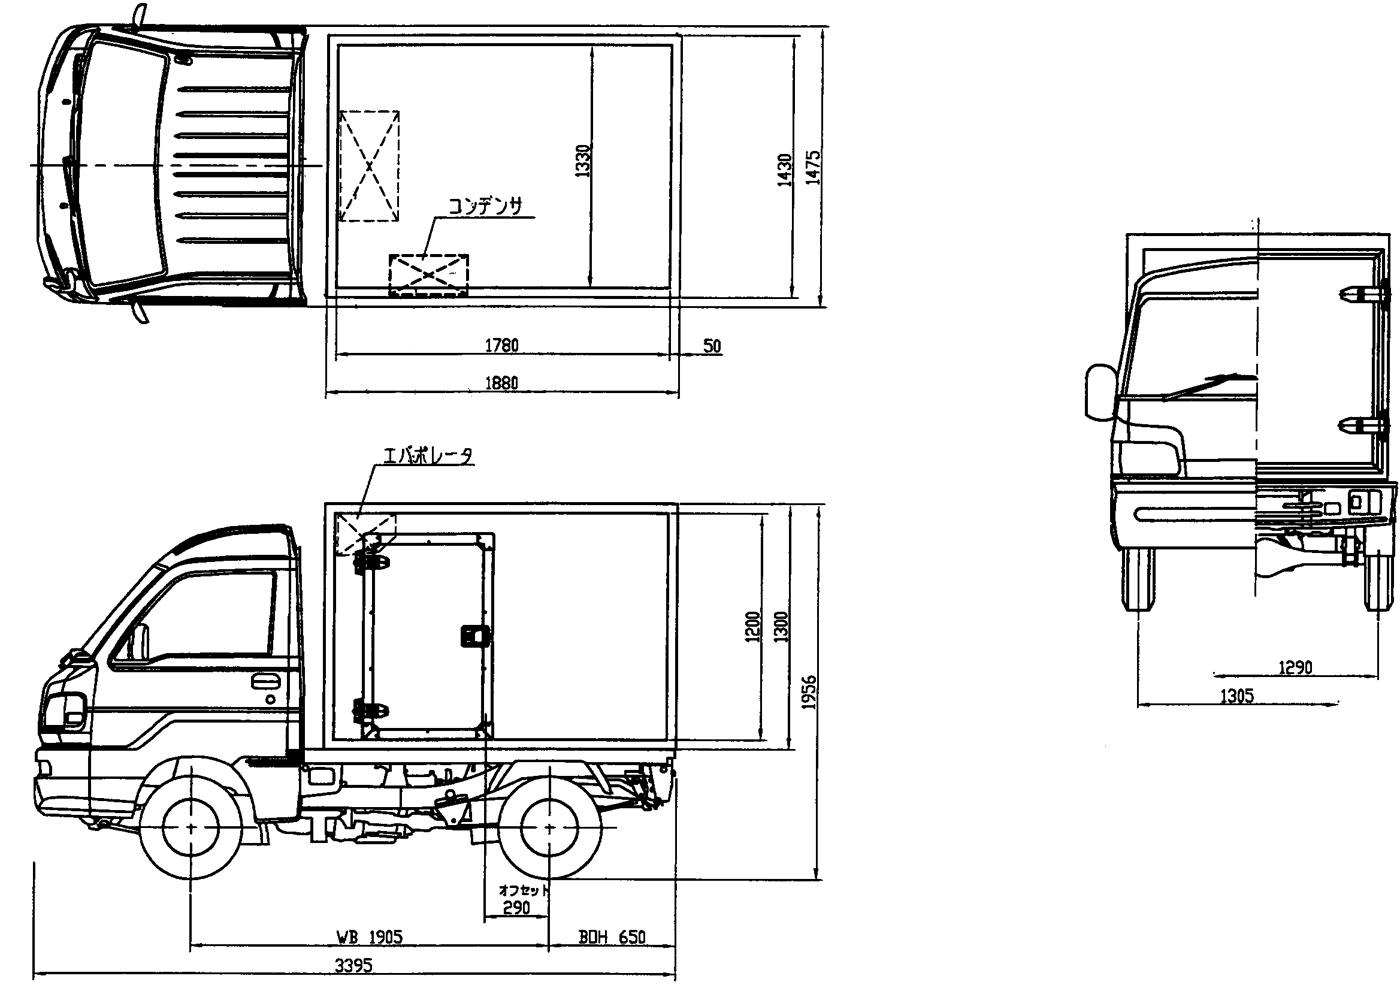 東プレ製 冷蔵冷凍車 中温 見取り図